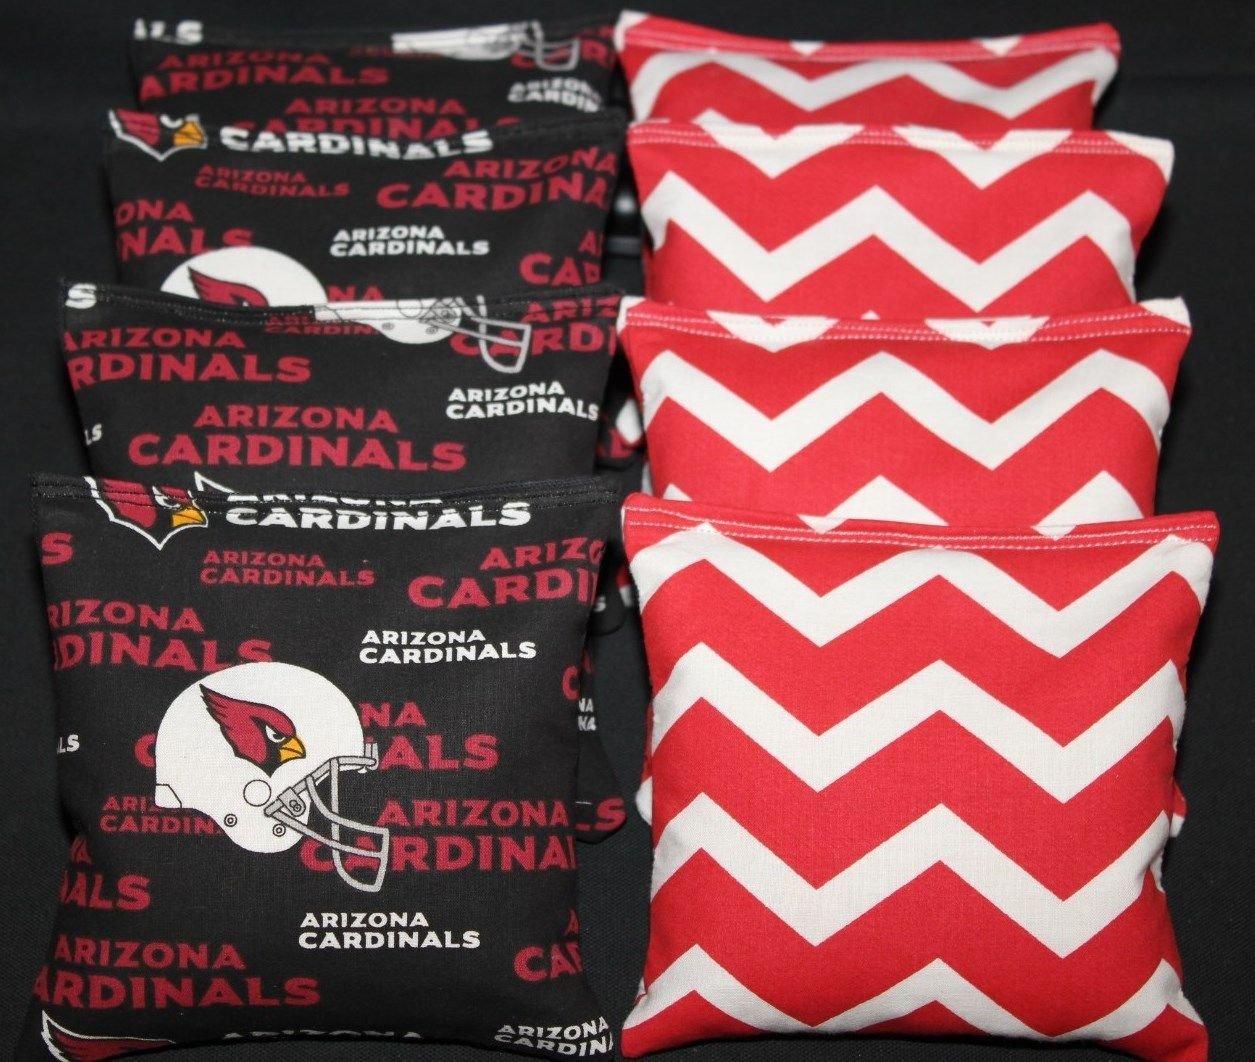 Arizona Cardinals Red Cardinals Arizona Chevron Cornhole Red Beanバッグ8 ACA Regulation Corn穴バッグ B01MRAVB6L, WAプラス:f1793628 --- itxassou.fr